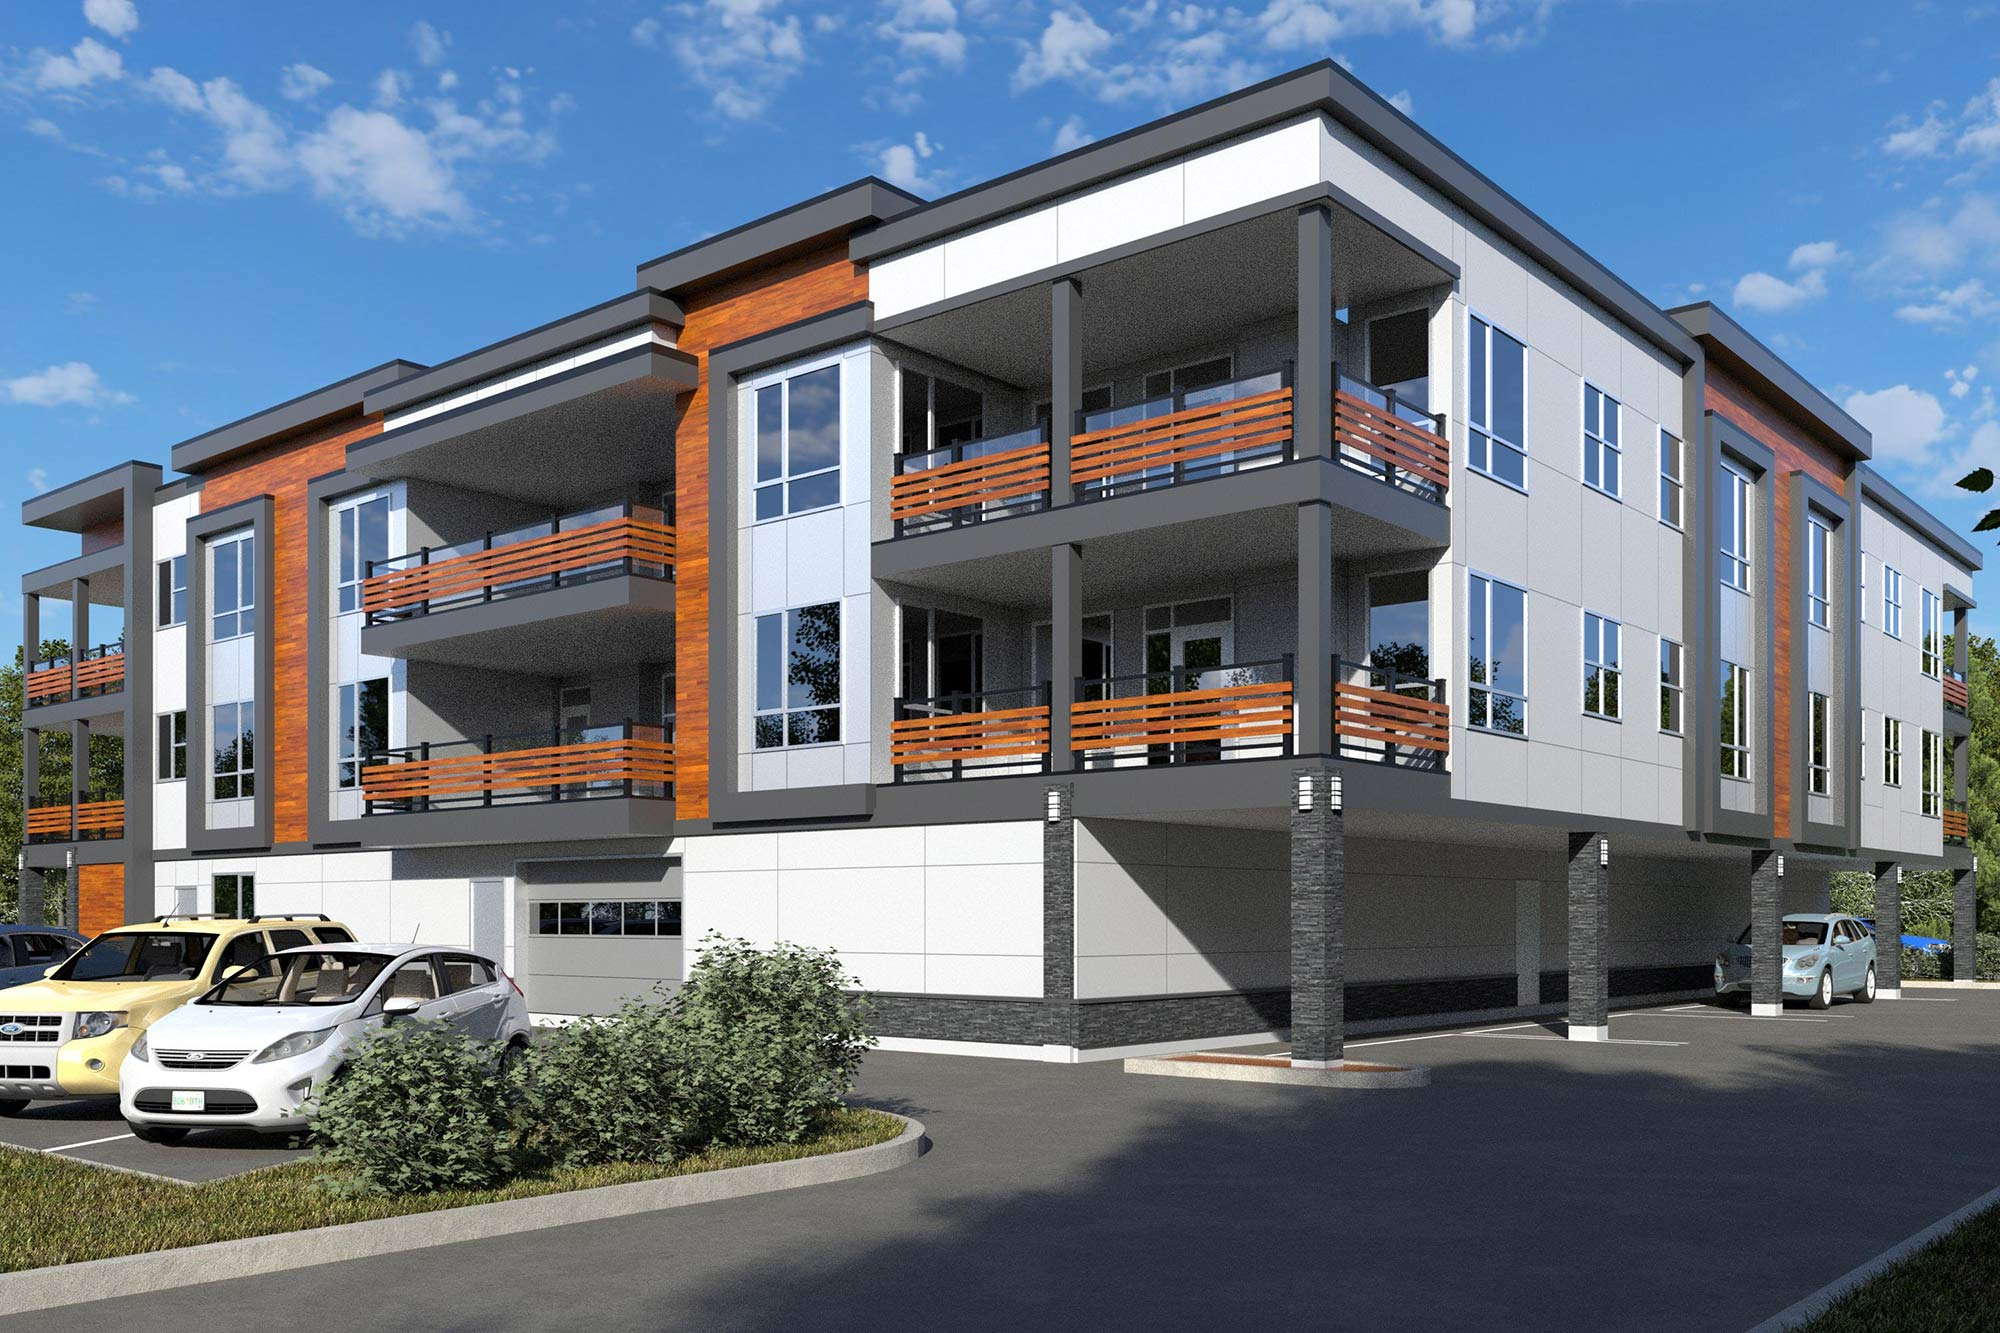 Fairford Apartments - 160 Fairford St E - Moose Jaw